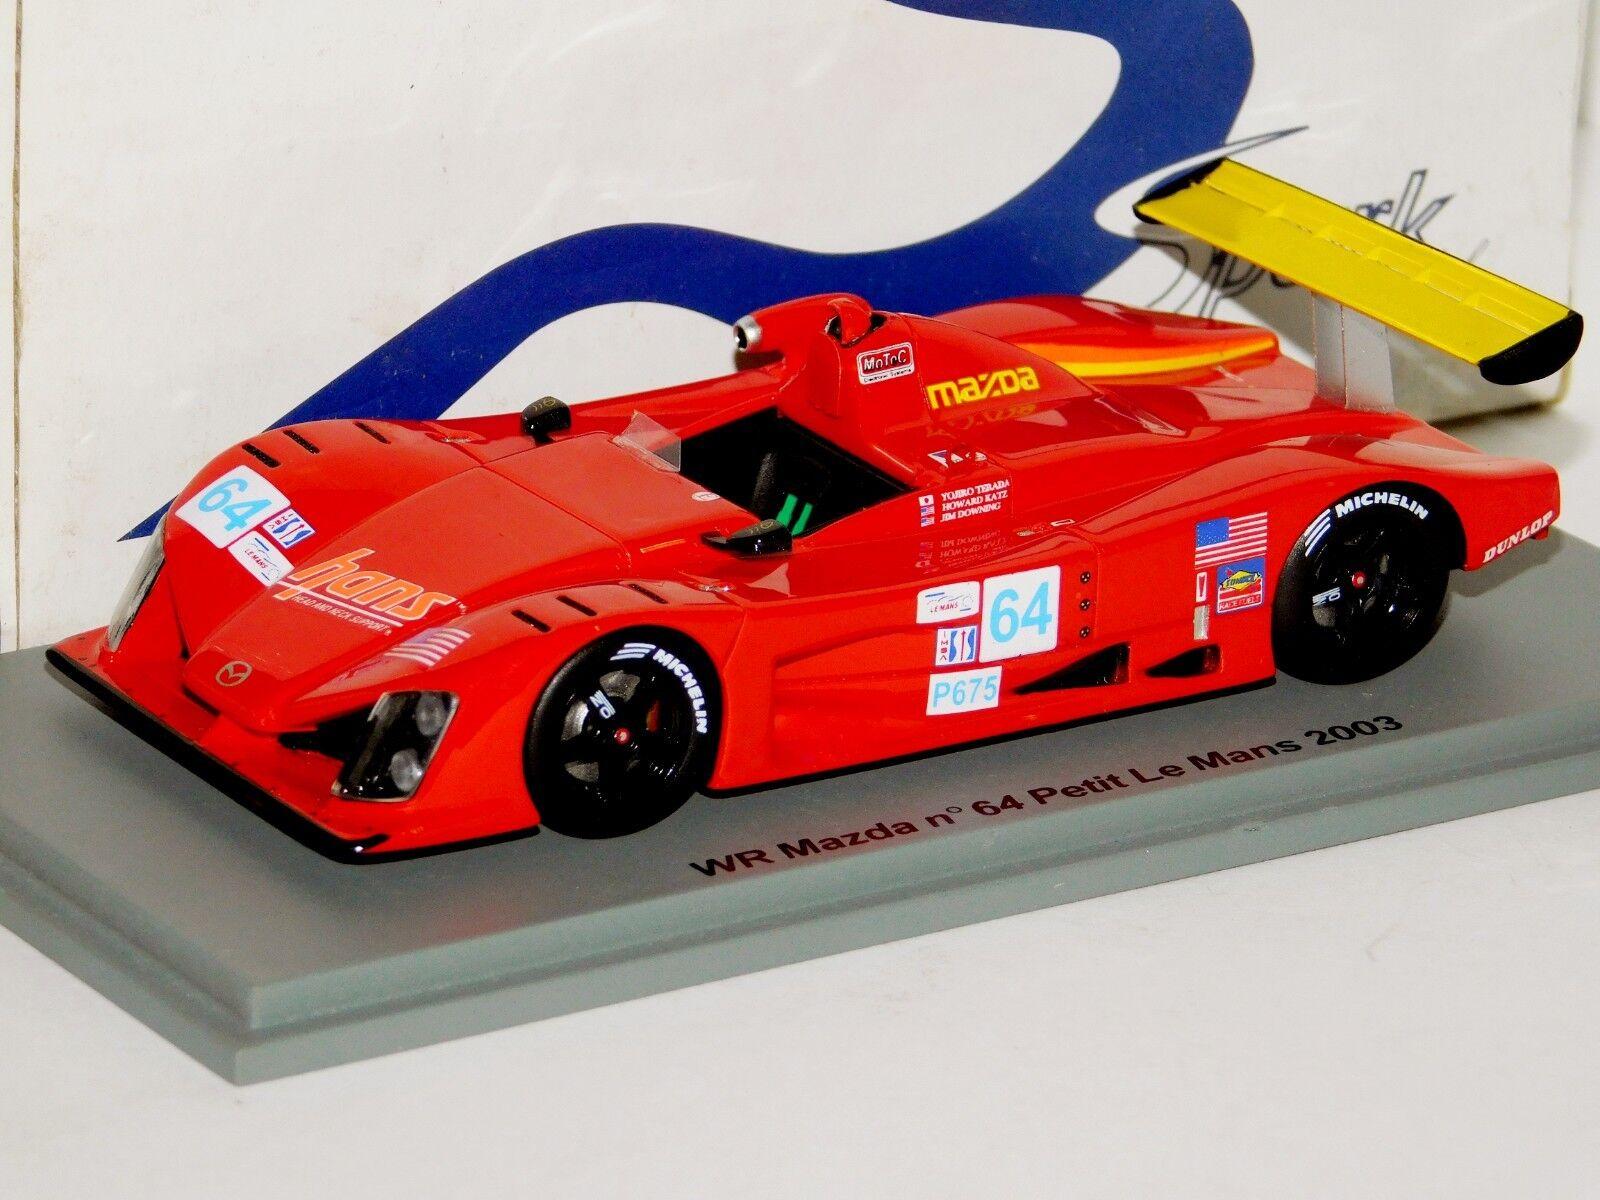 WR Mazda  64 Petit Le Mans 2003 Spark construire 17 1 43